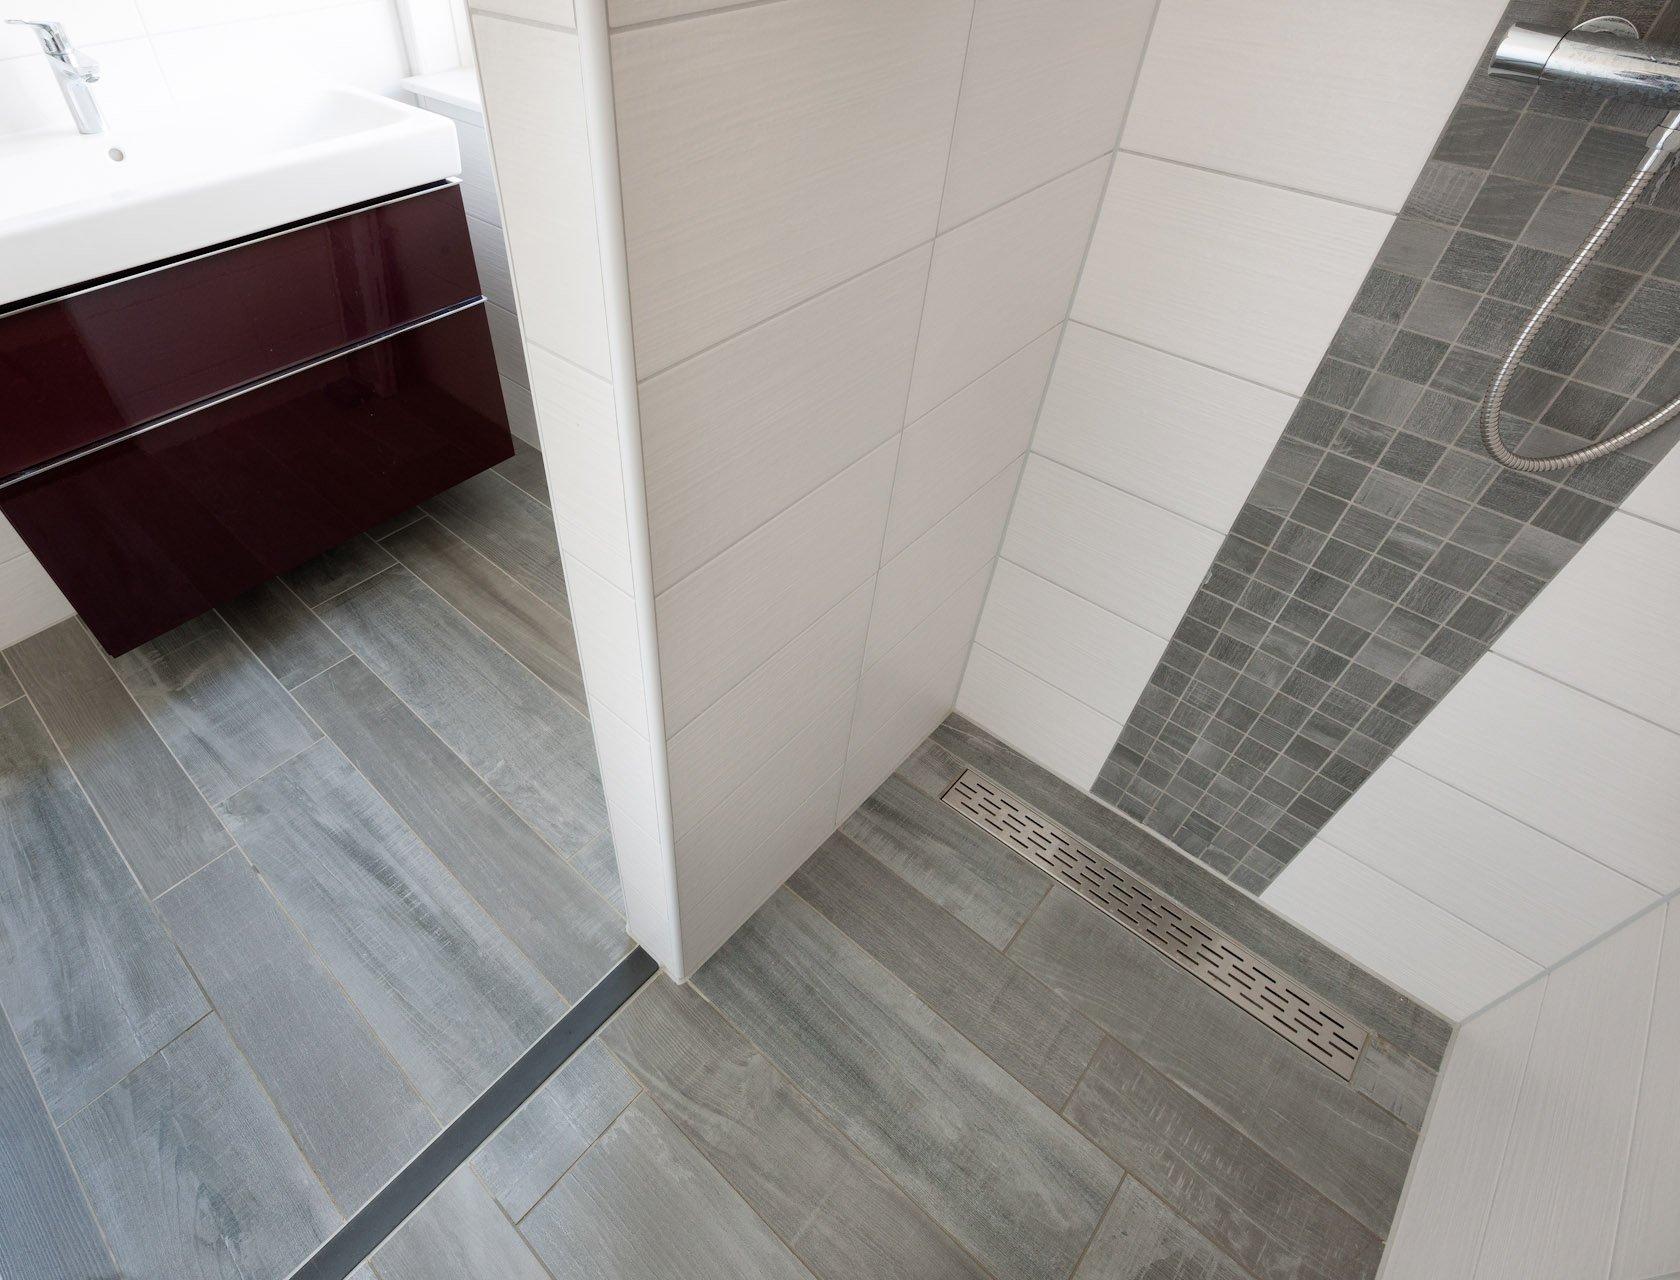 Wandtegels Badkamer Antraciet : Lichtgrijze tegels badkamer badkamer rolgordijn lichtgrijs 110cm